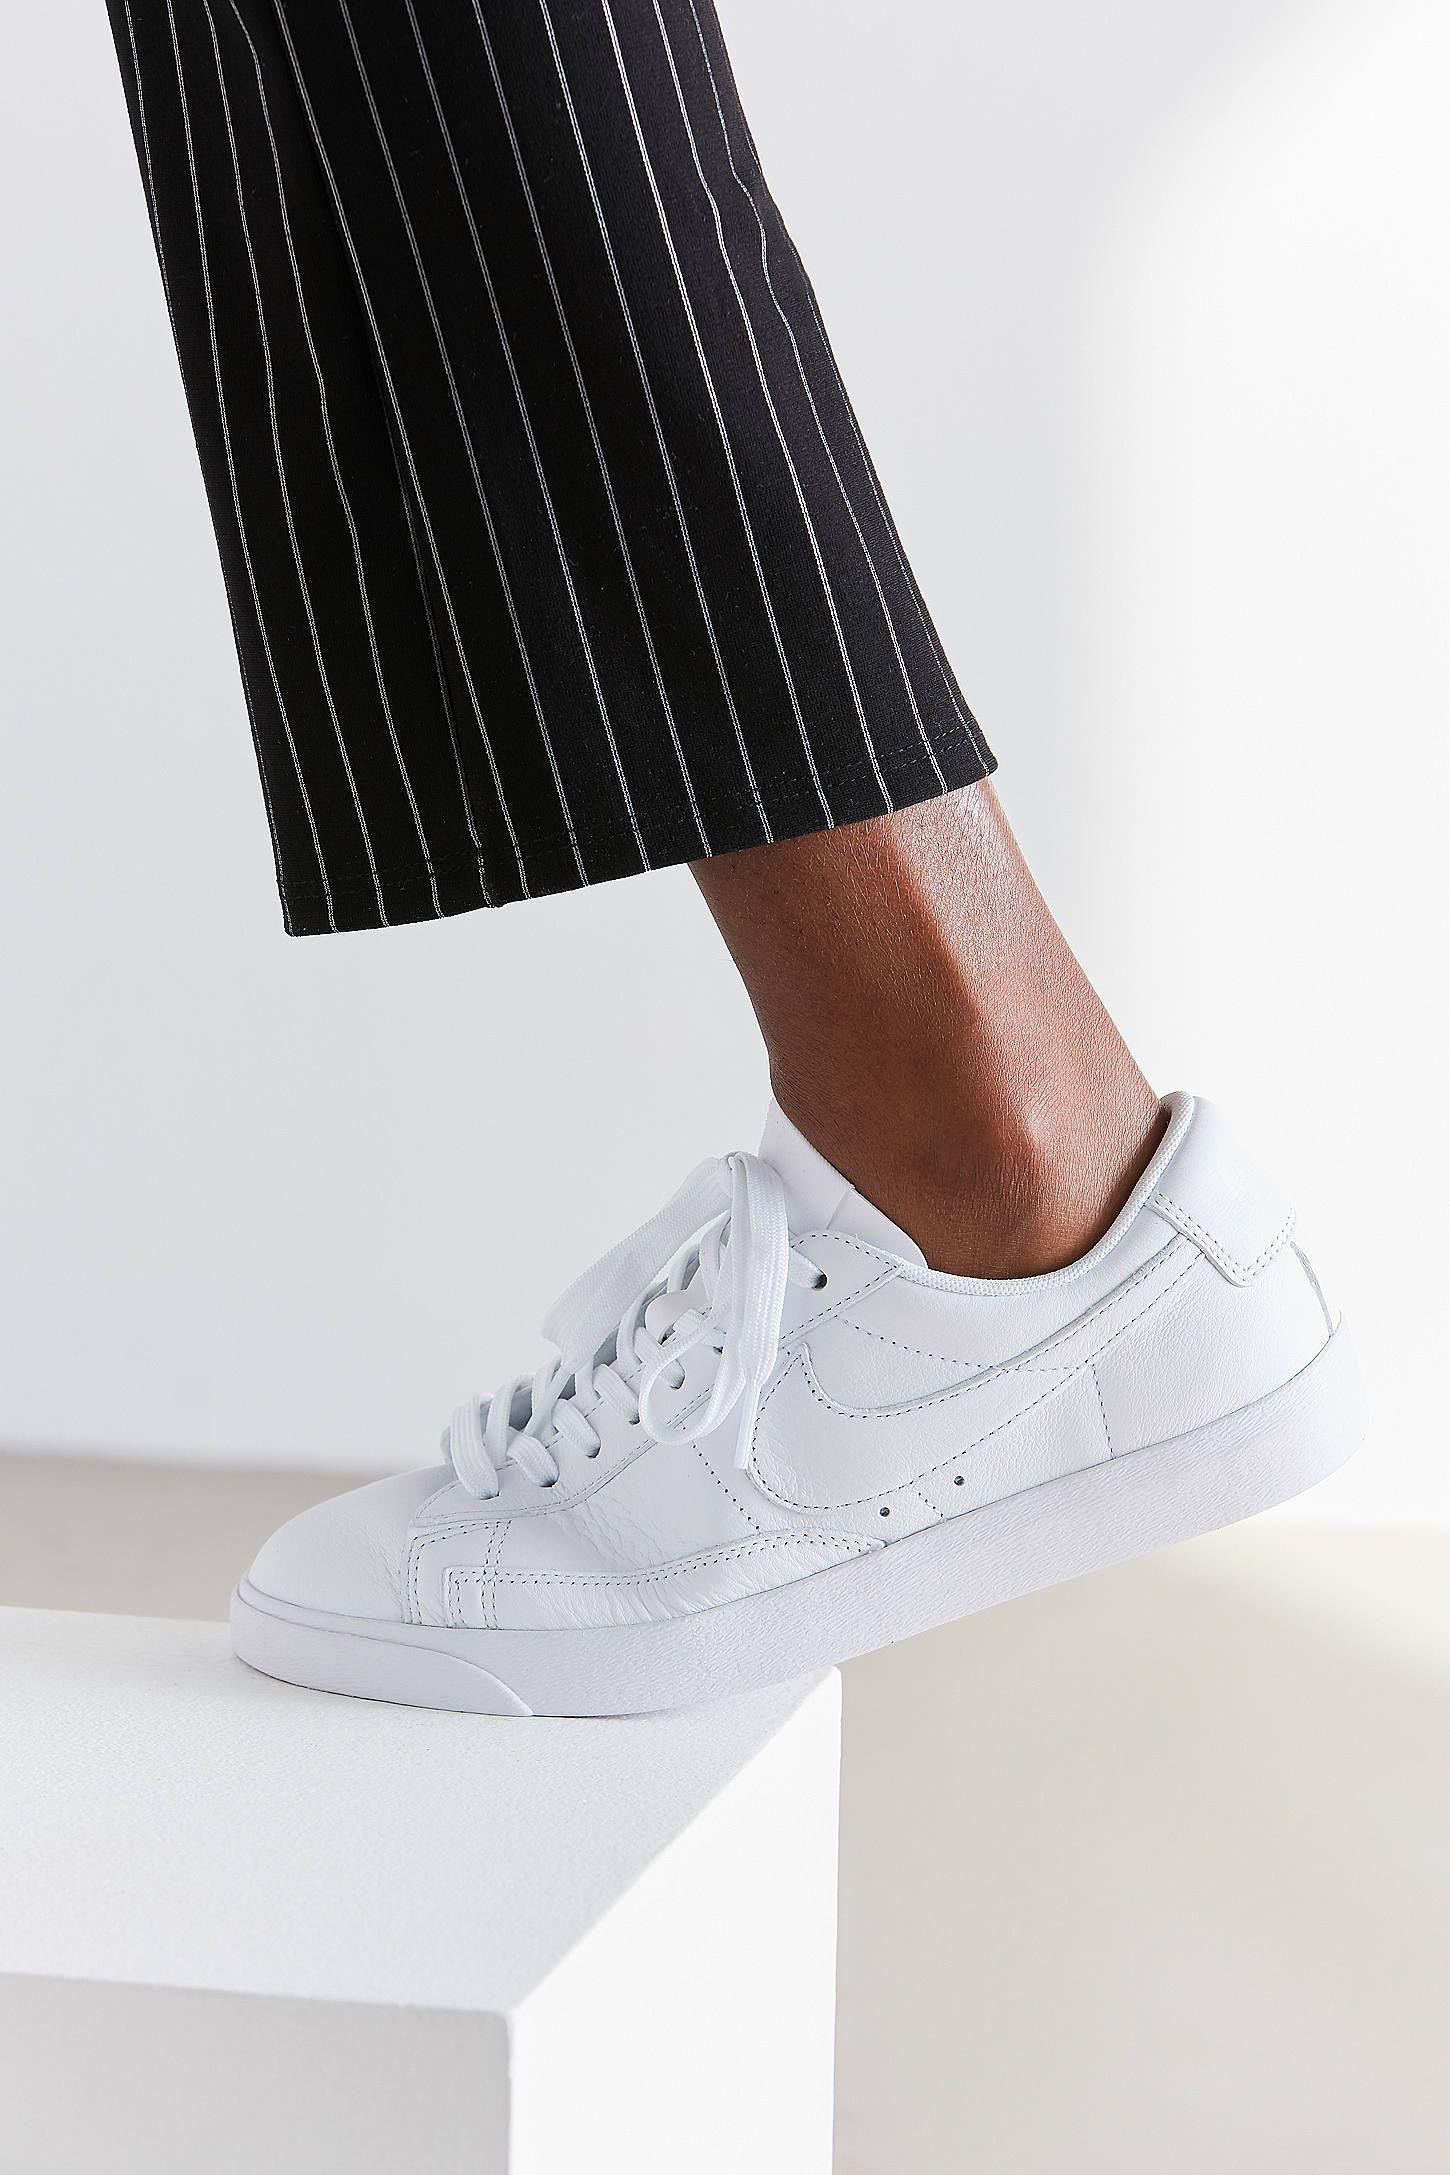 Nike Blazer Low LE Sneaker | Nike blazer, Casual shoes outfit ...